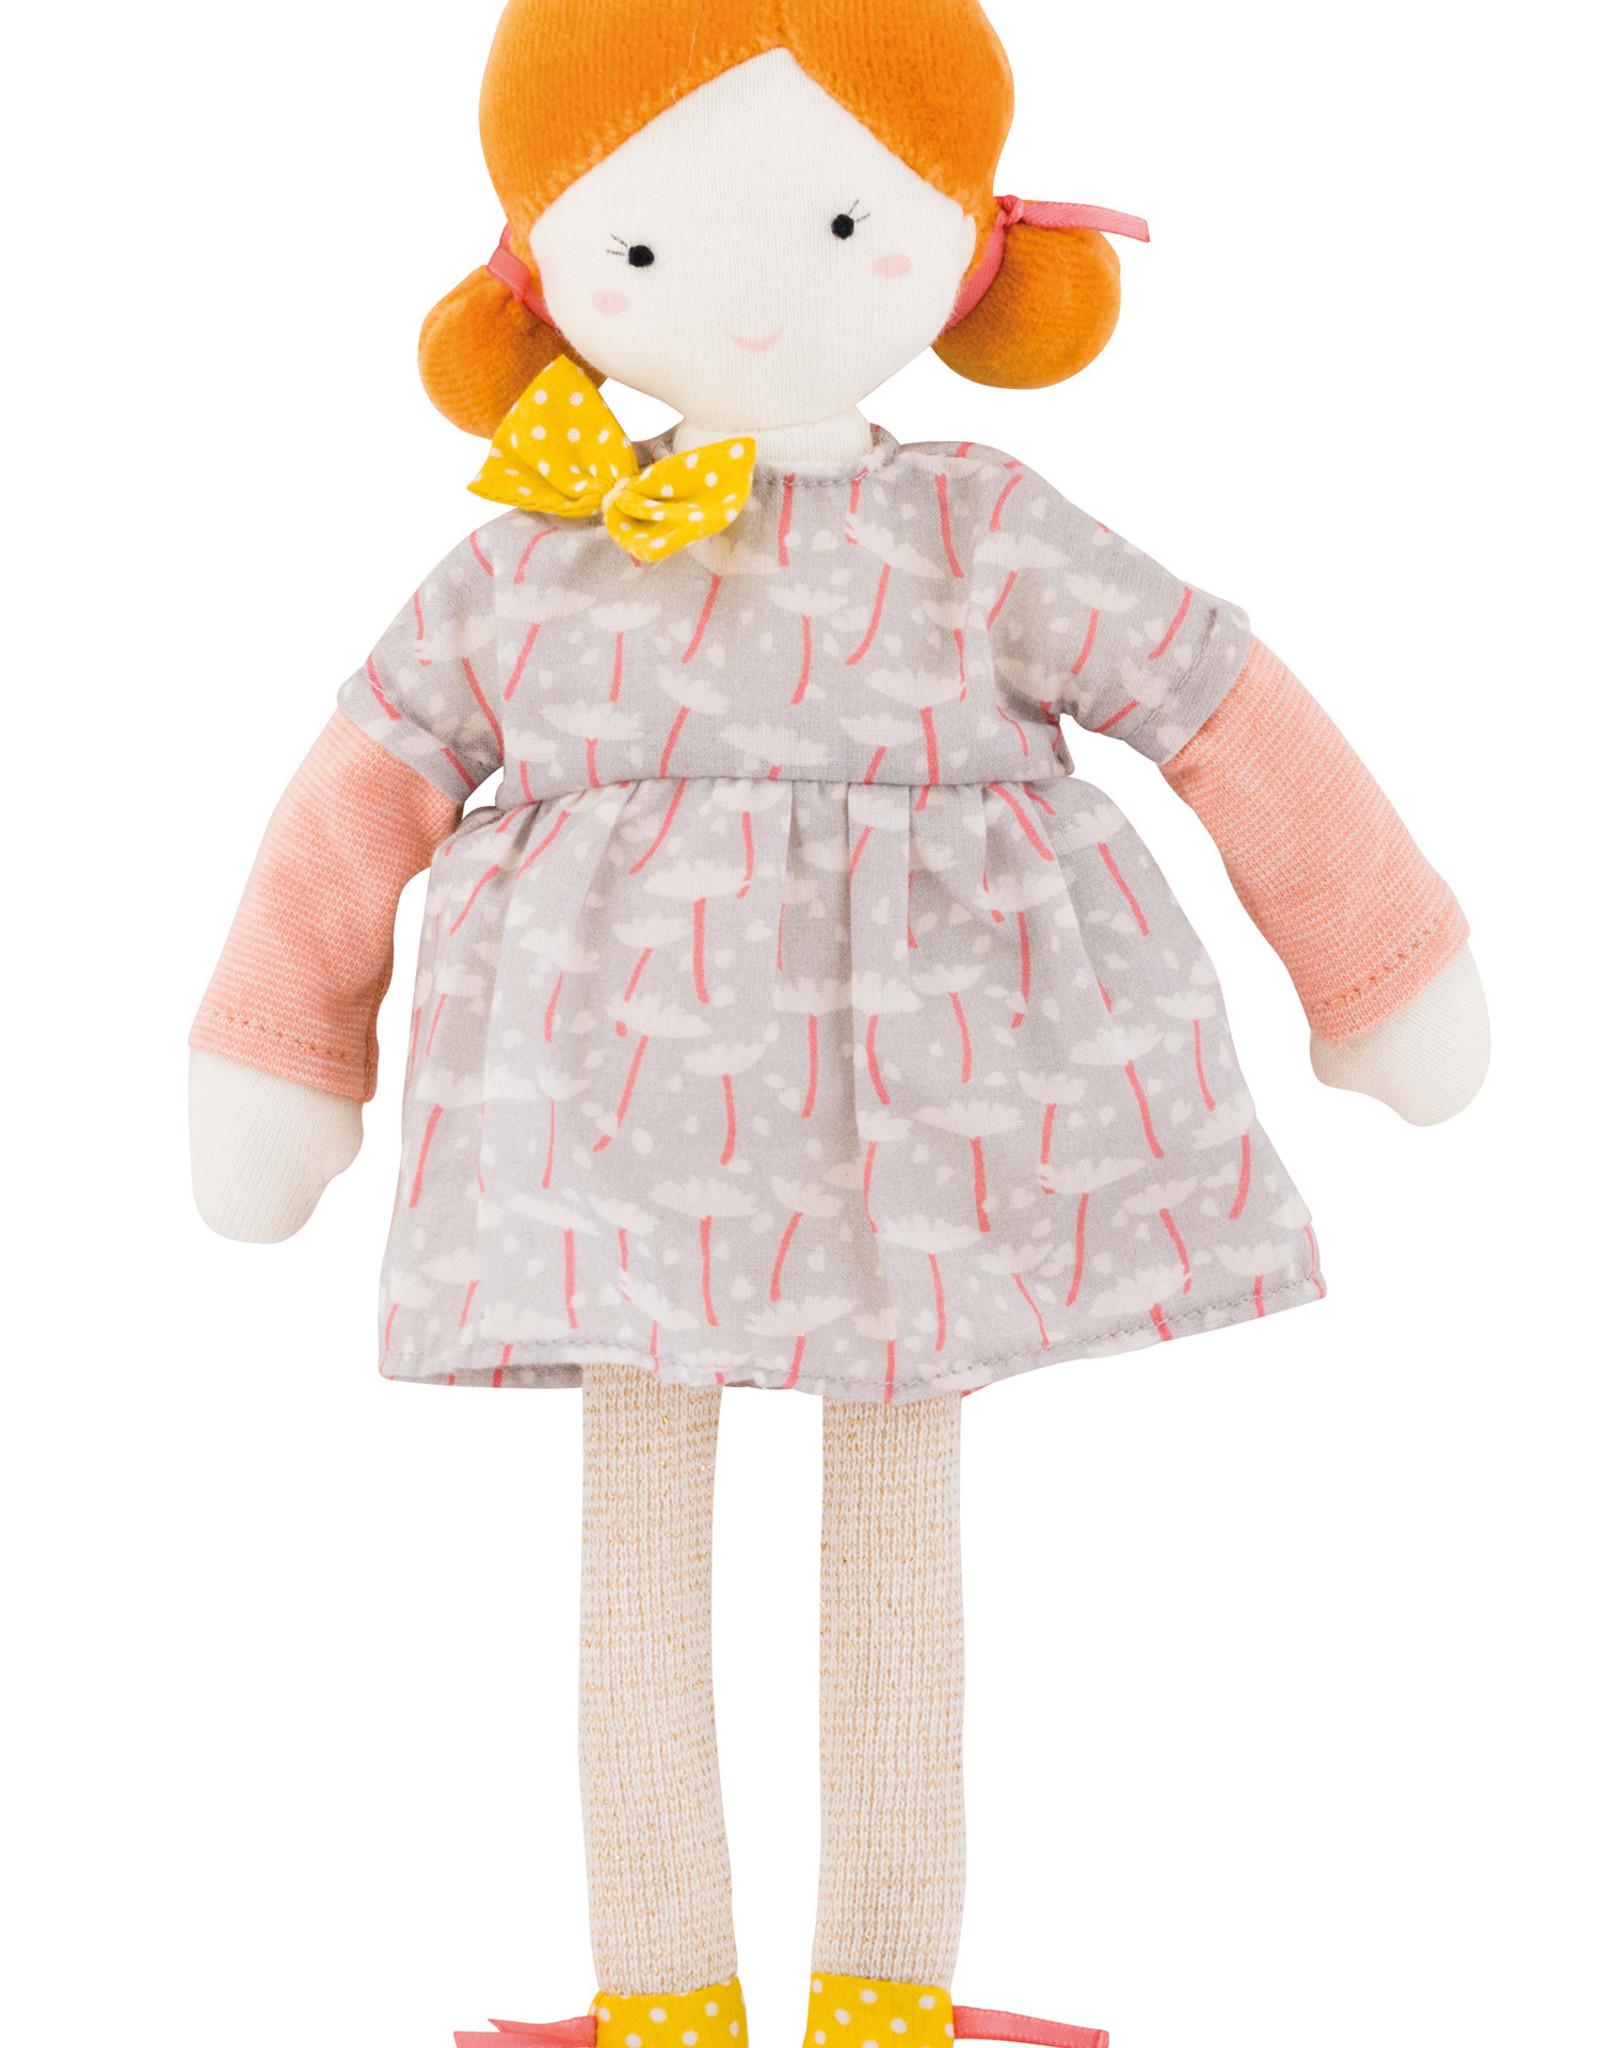 Little Parisian dolls